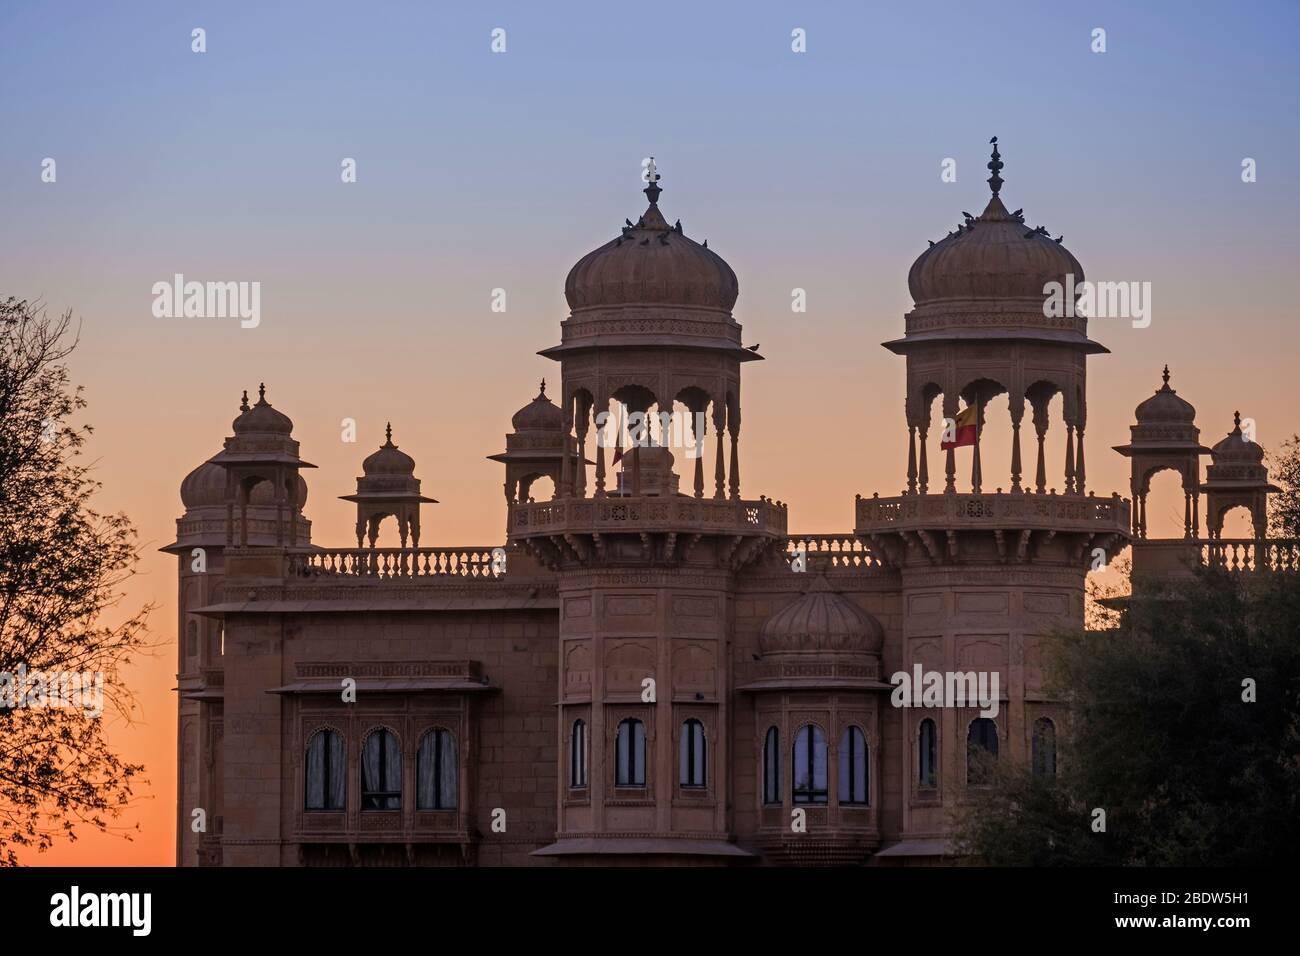 Jawahar Niwas Palace Jaisalmer Rajasthan Inde Banque D'Images